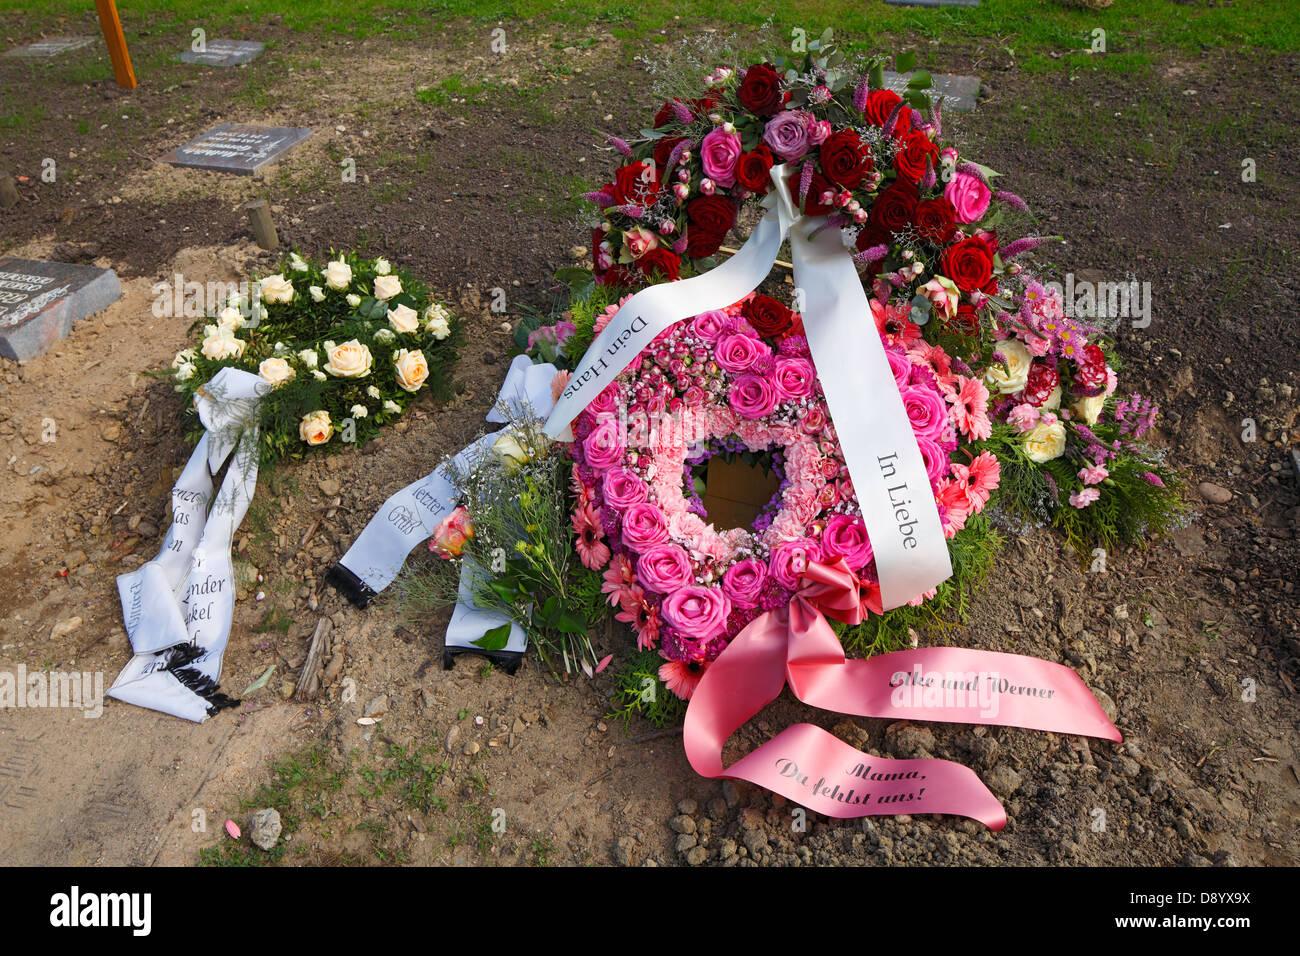 Friedhof Tod Trauer Grablegung Grab Urne Grab Blumen Rosen Kranz koronale florales